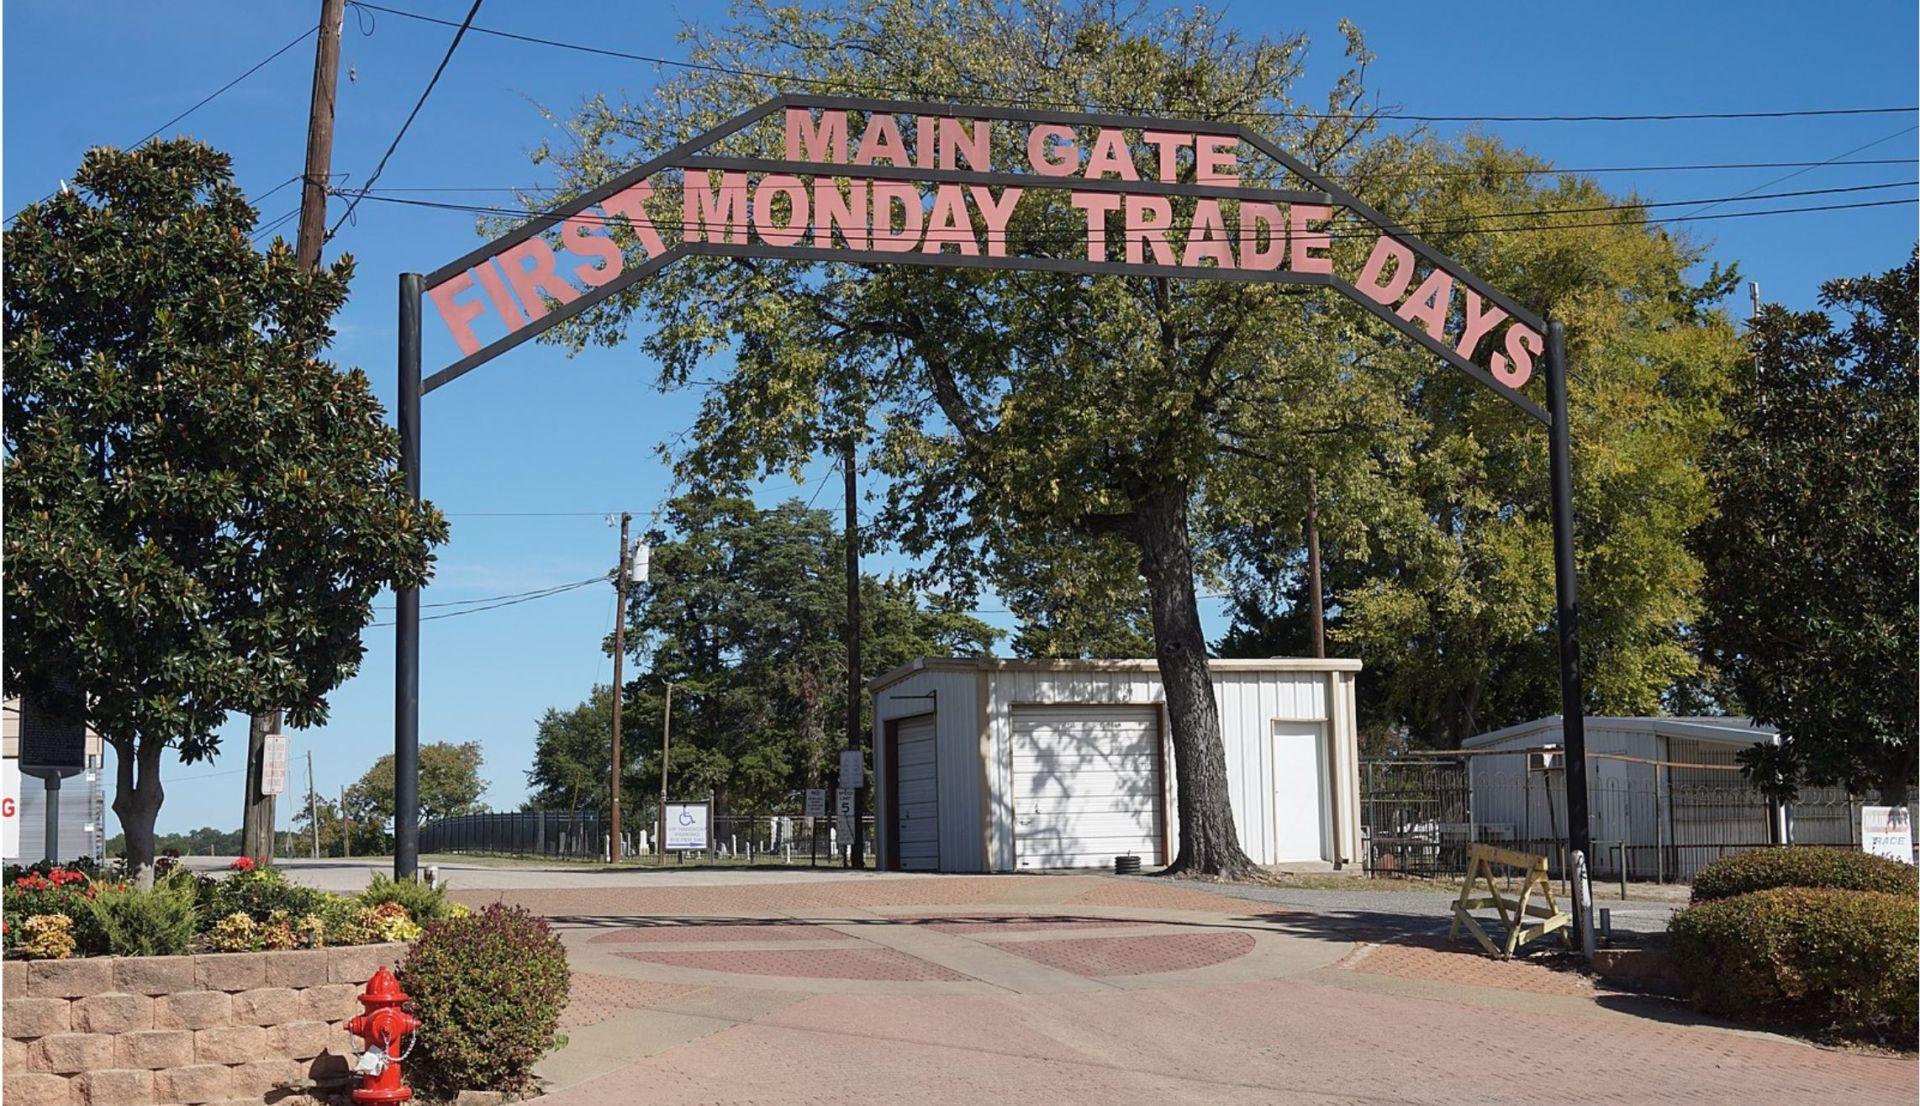 Chợ trời lớn nhất thế giới ở Texas TS-Dallascounterfeit04-040721